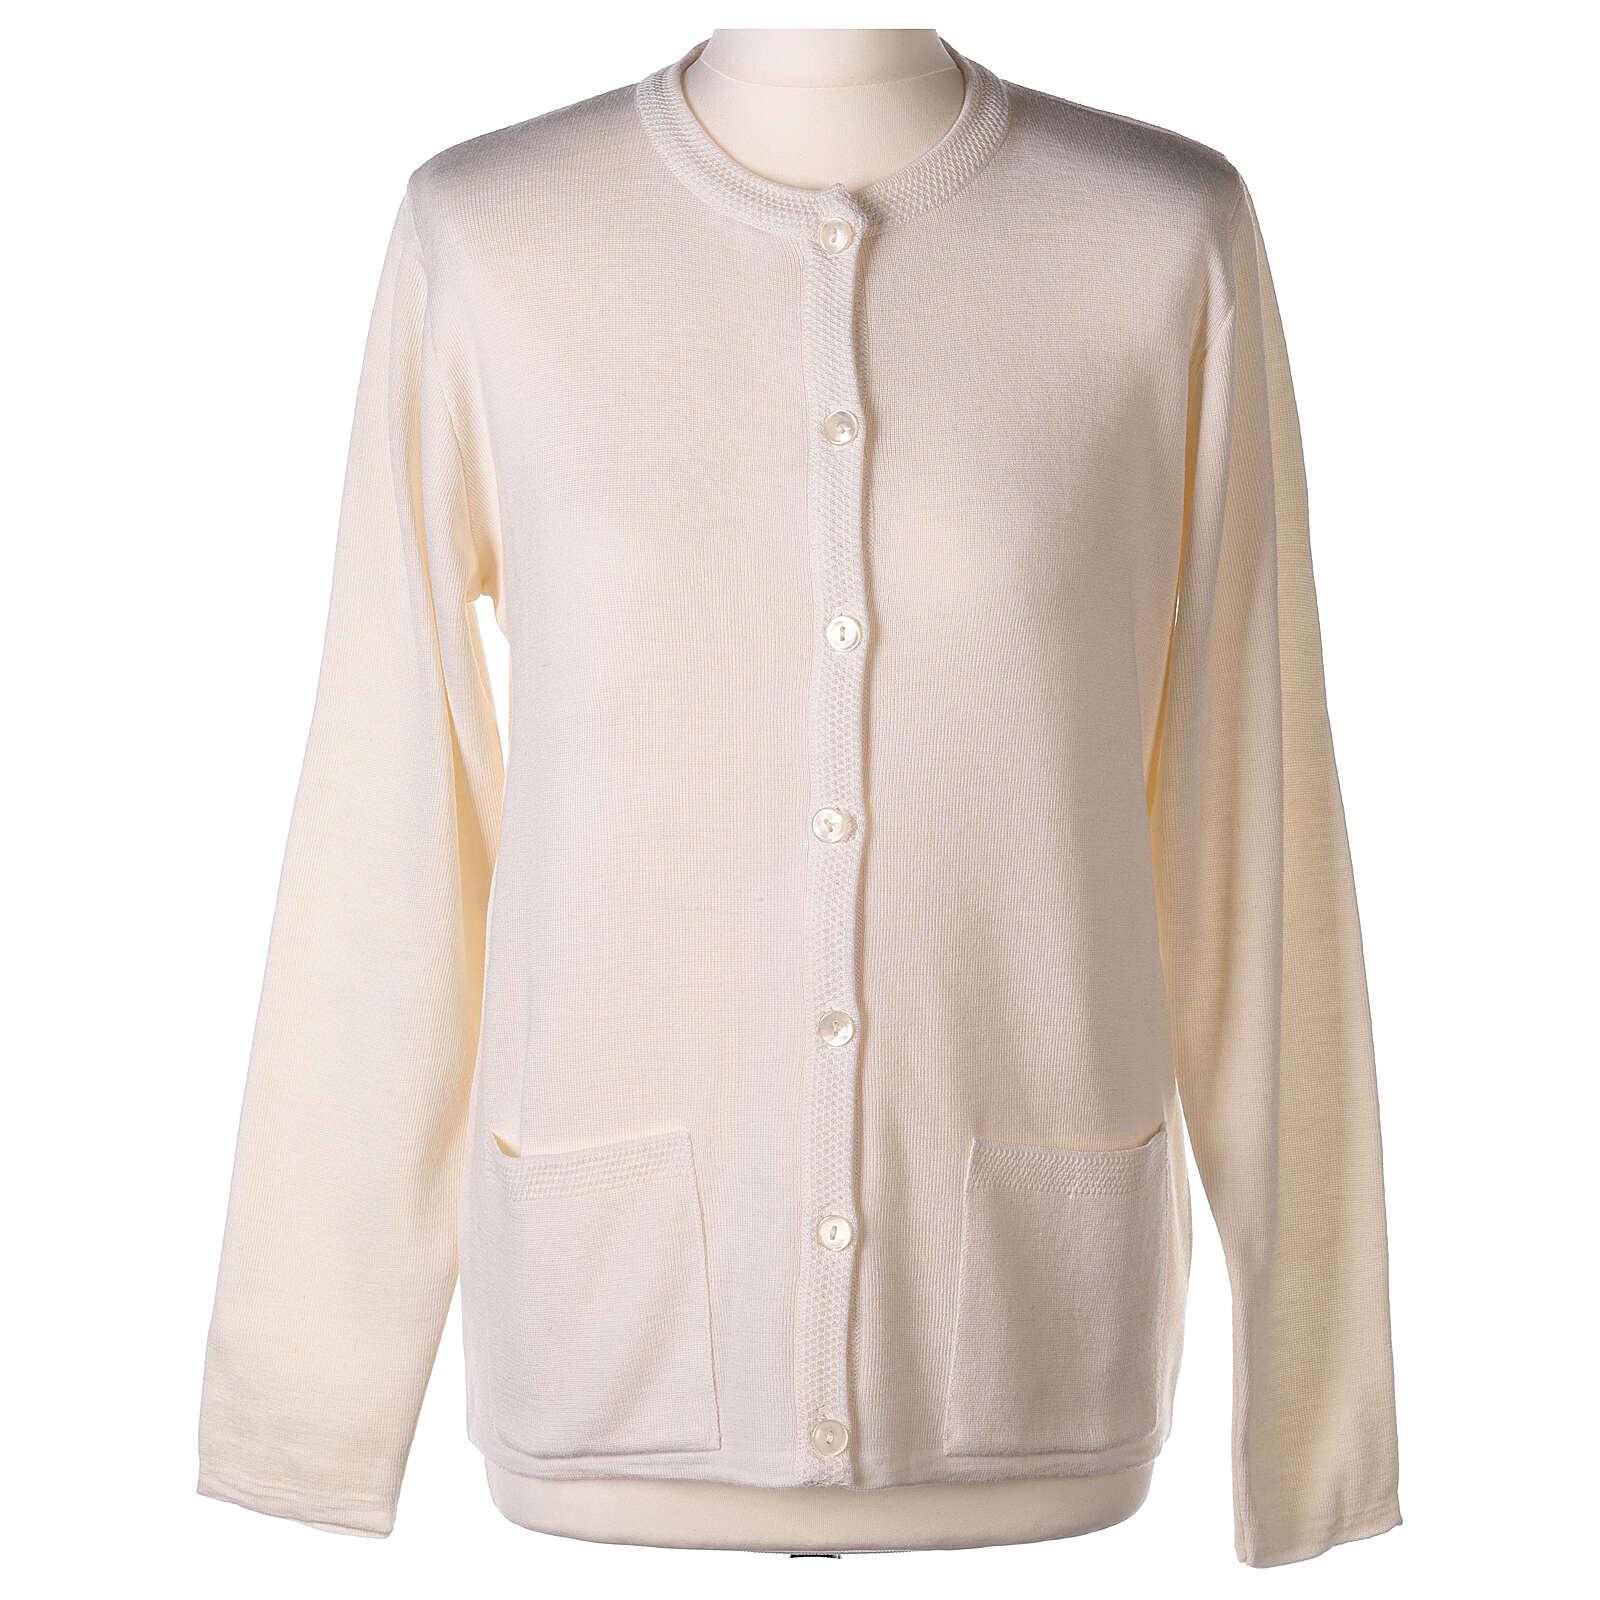 Rebeca monja blanca coreana bolsillos punto unido 50% acrílico 50% lana merina In Primis 4